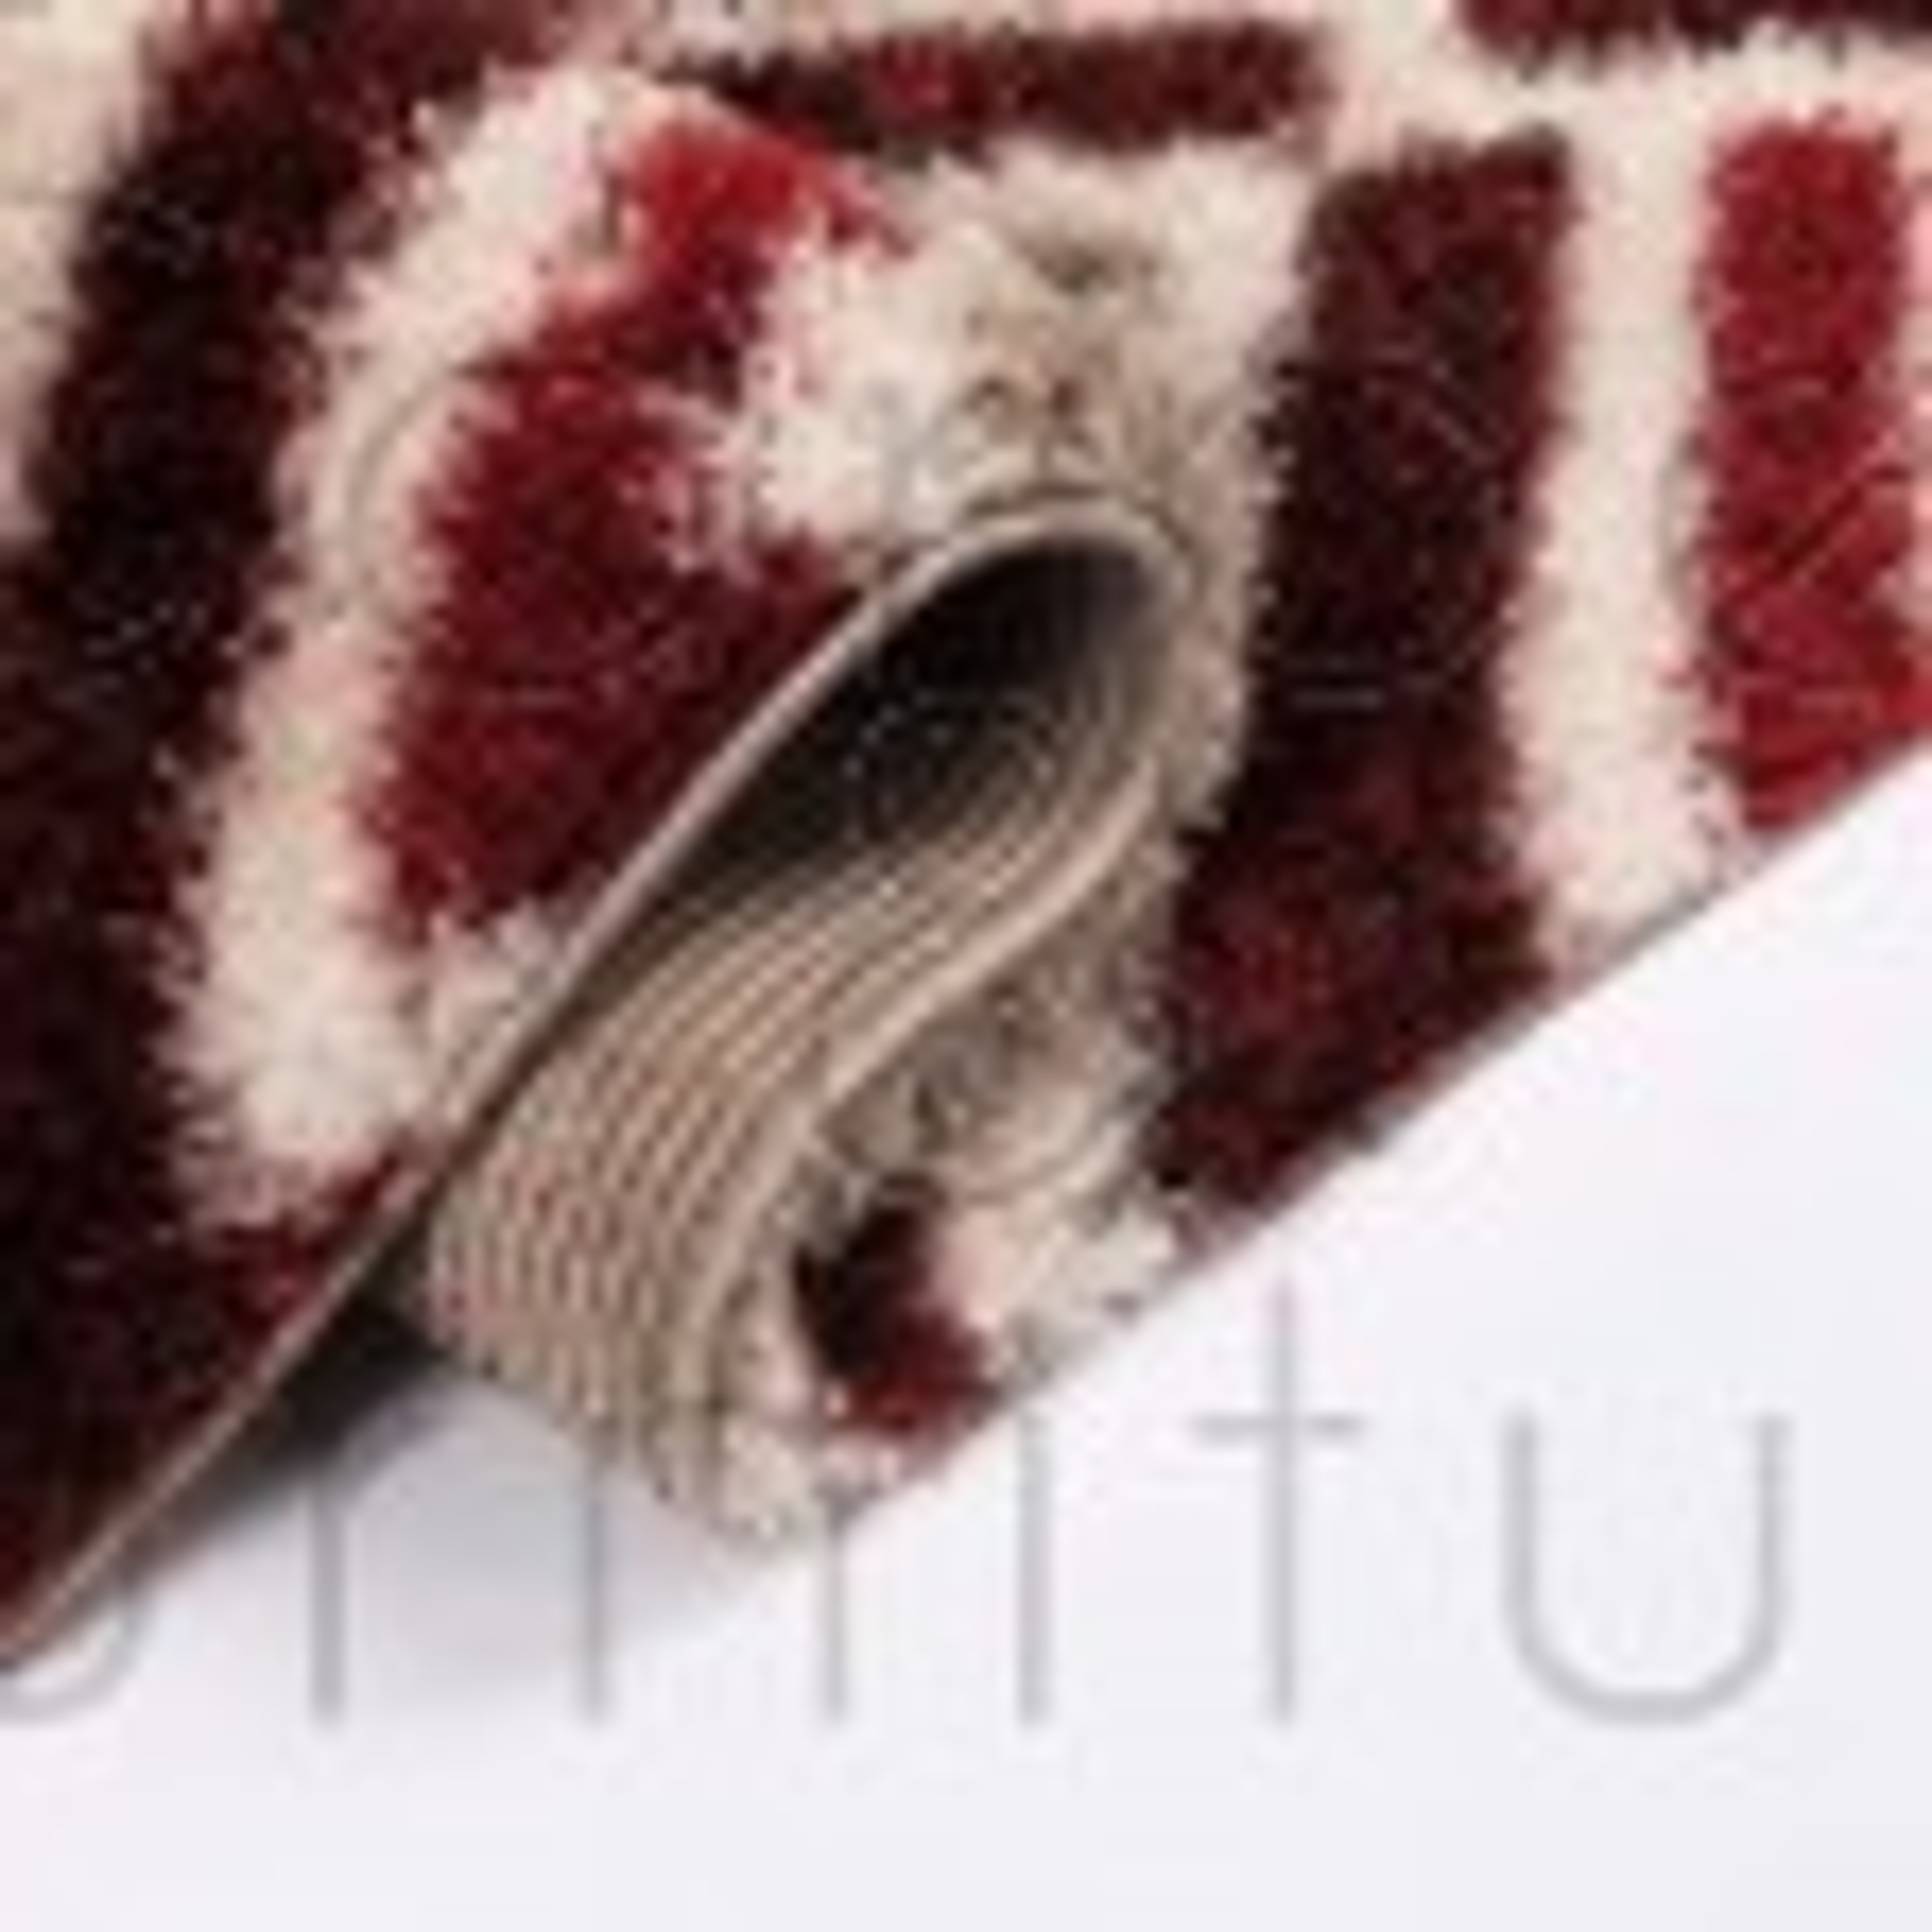 "Velvet Bijoux Rug - Red Brown - Size 80 x 150 cm (2'8"" x 5')"